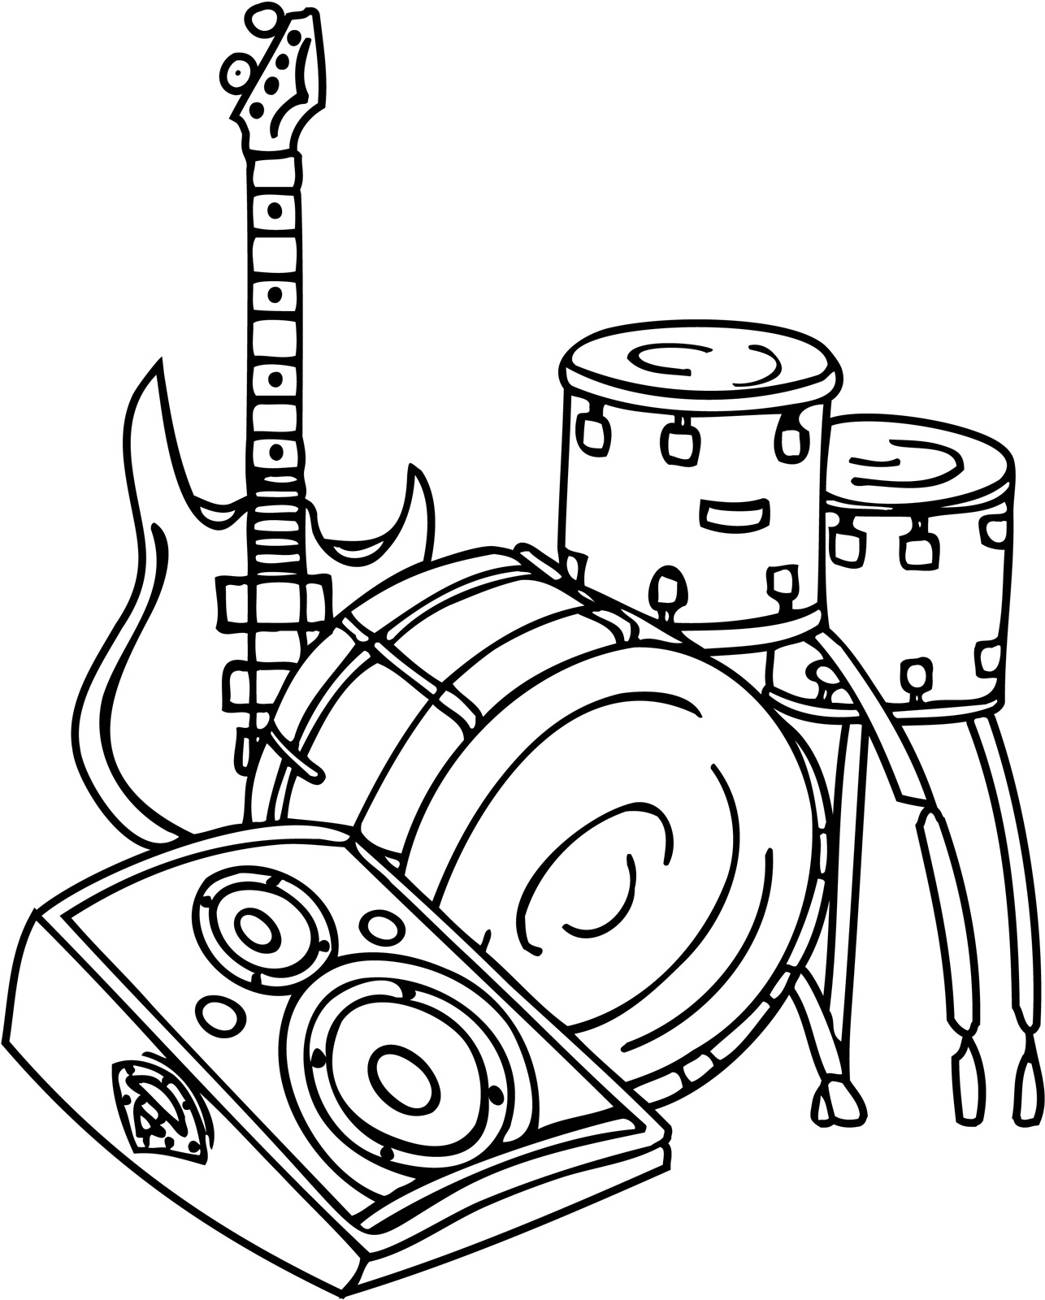 MUSIC-079